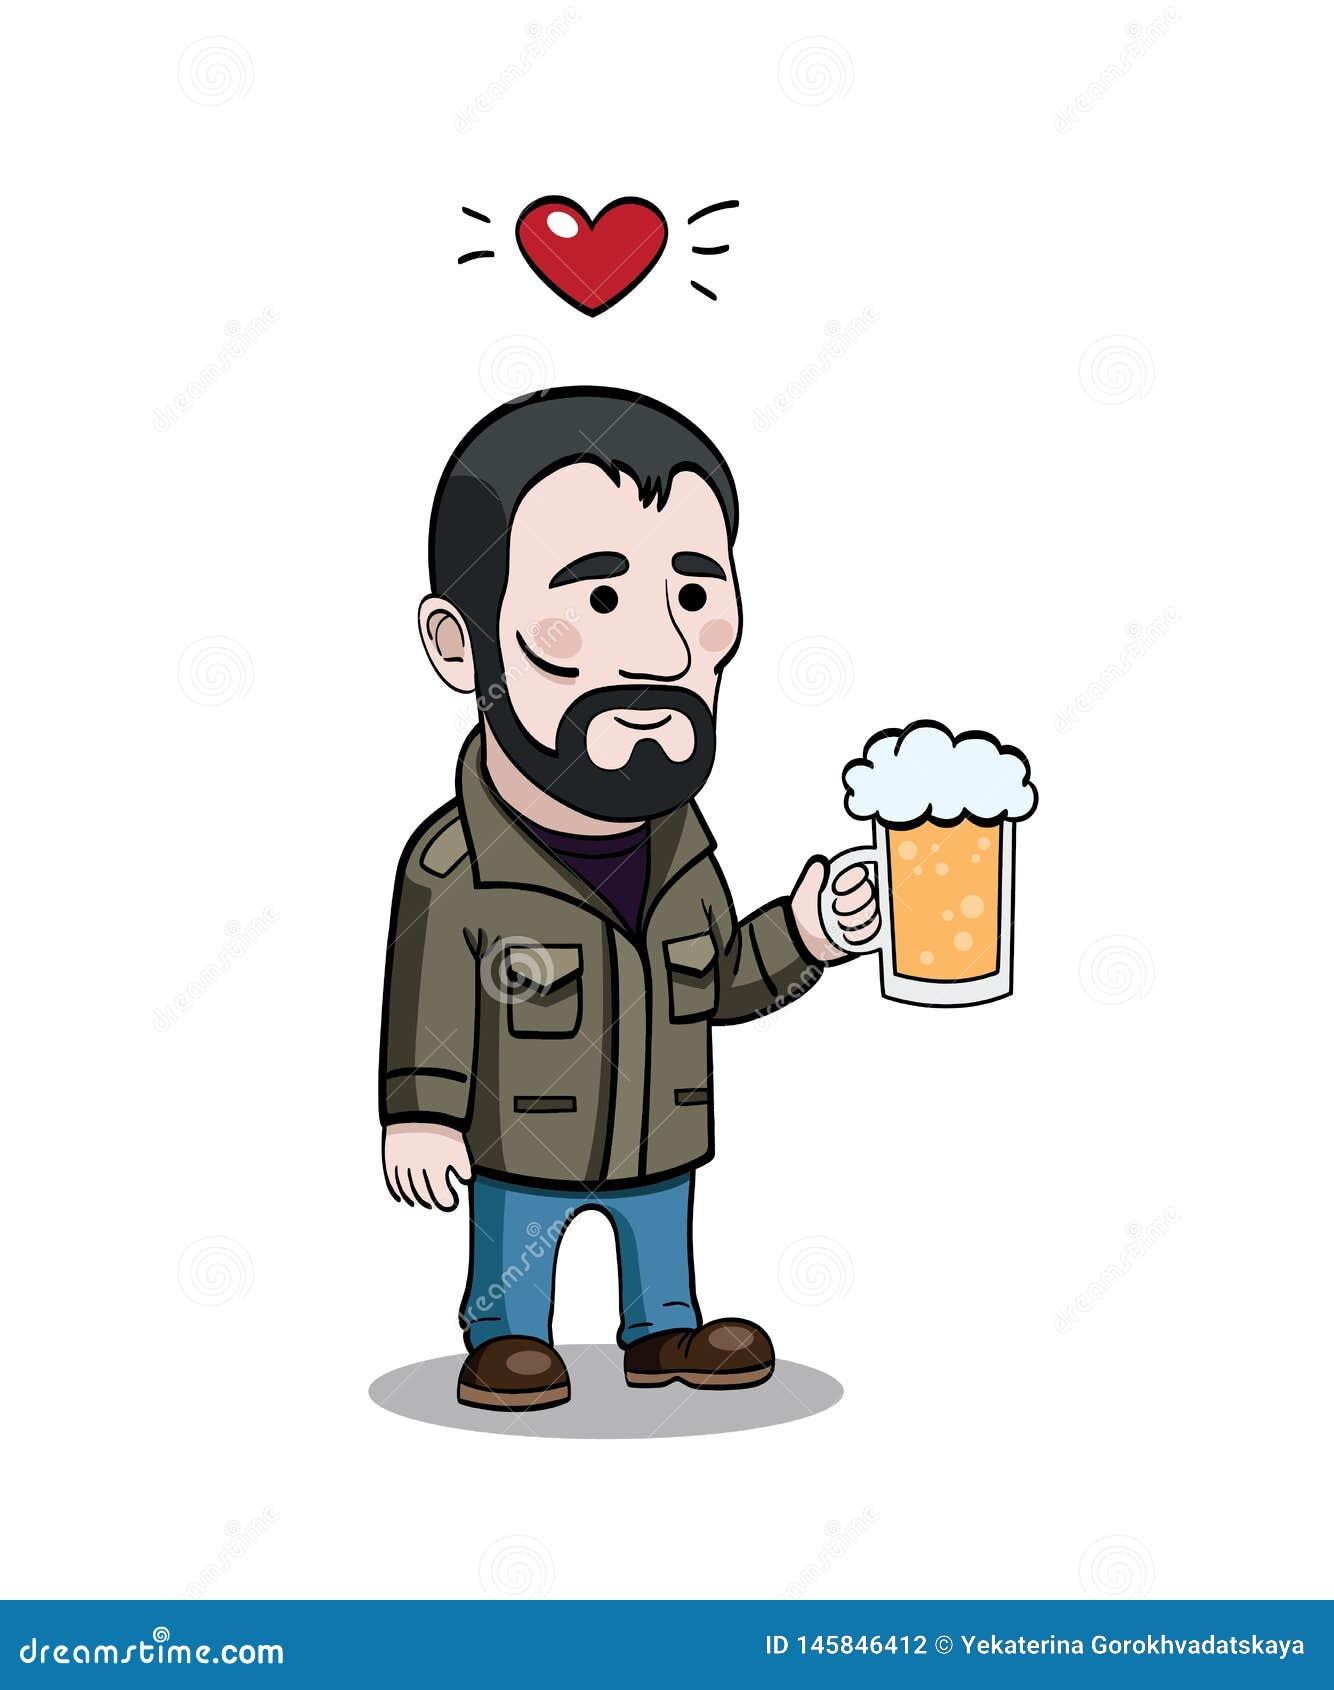 Cartoony character with beer mug